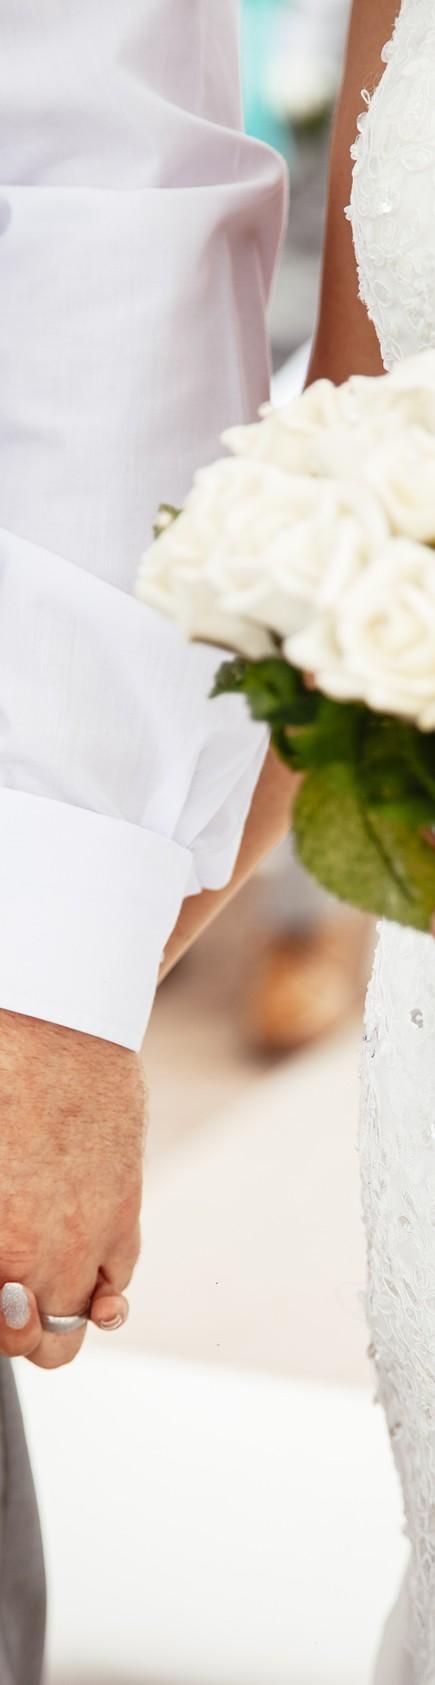 Wedding-Caroline-and-James-in-tenerife-myperfectwedding0207